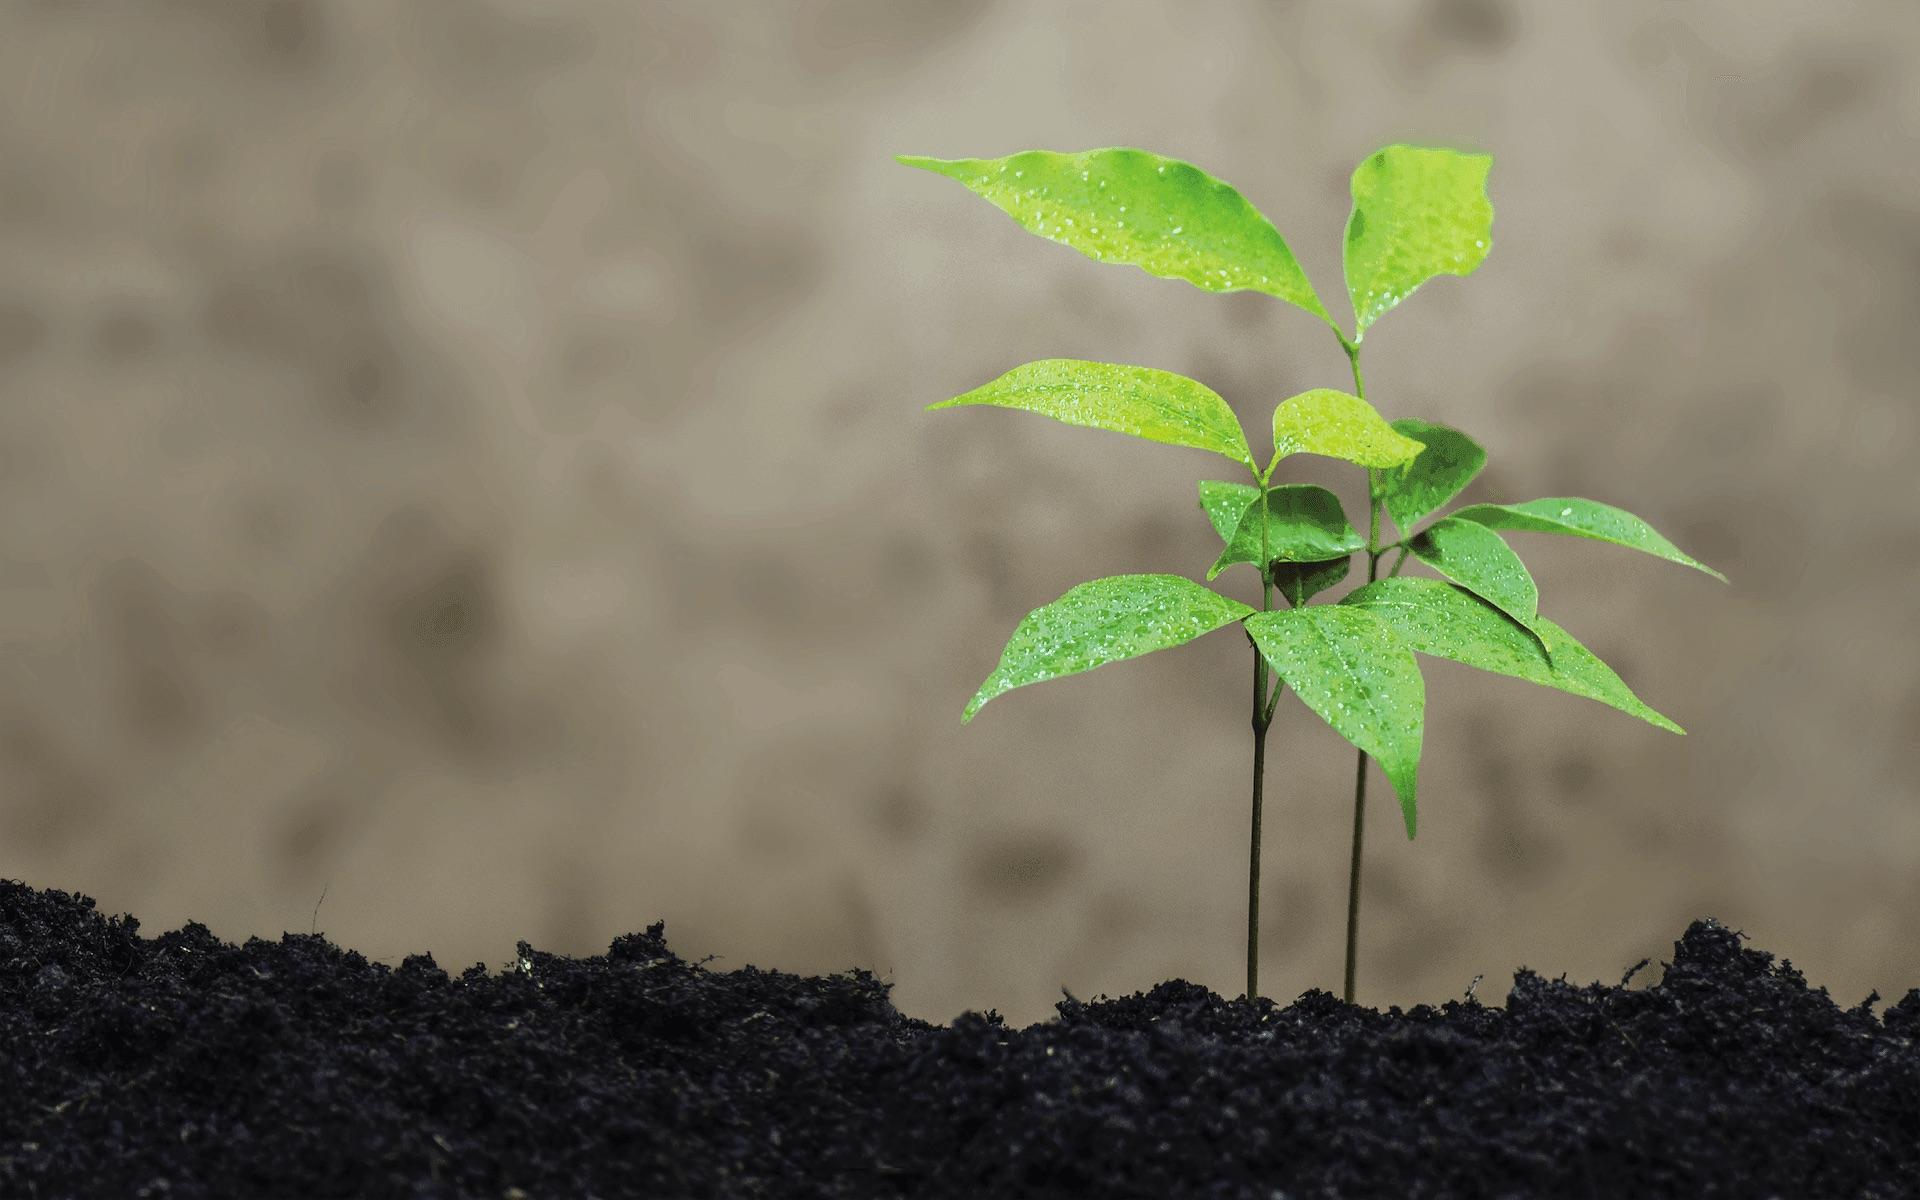 Plant Chemistry: An Internal Battle For Survival